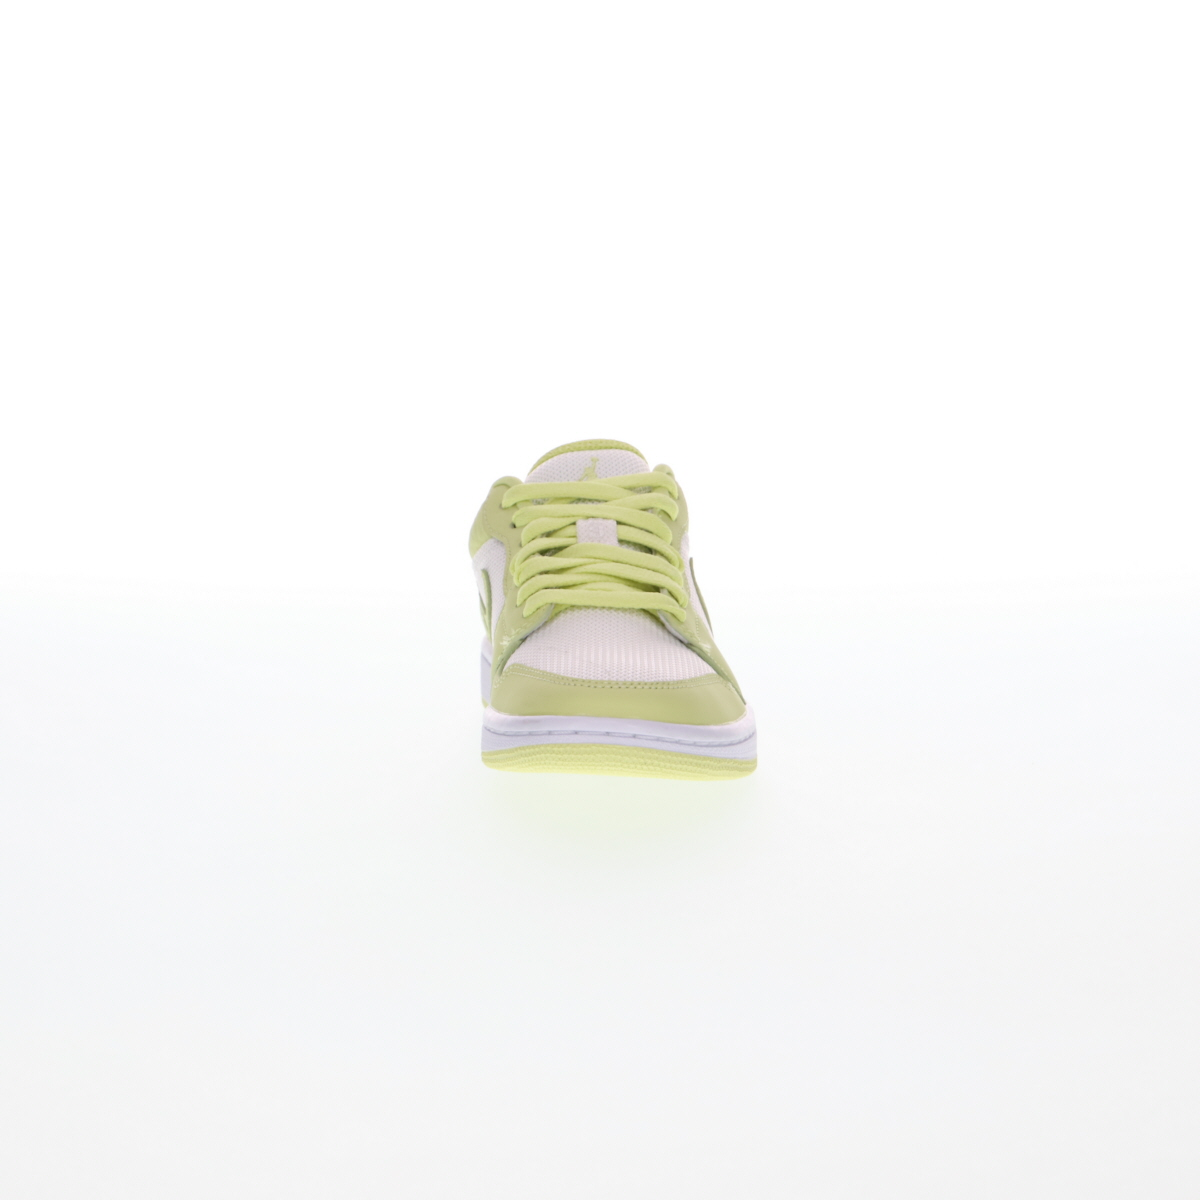 cheap air jordans and nike foamposite shoes women